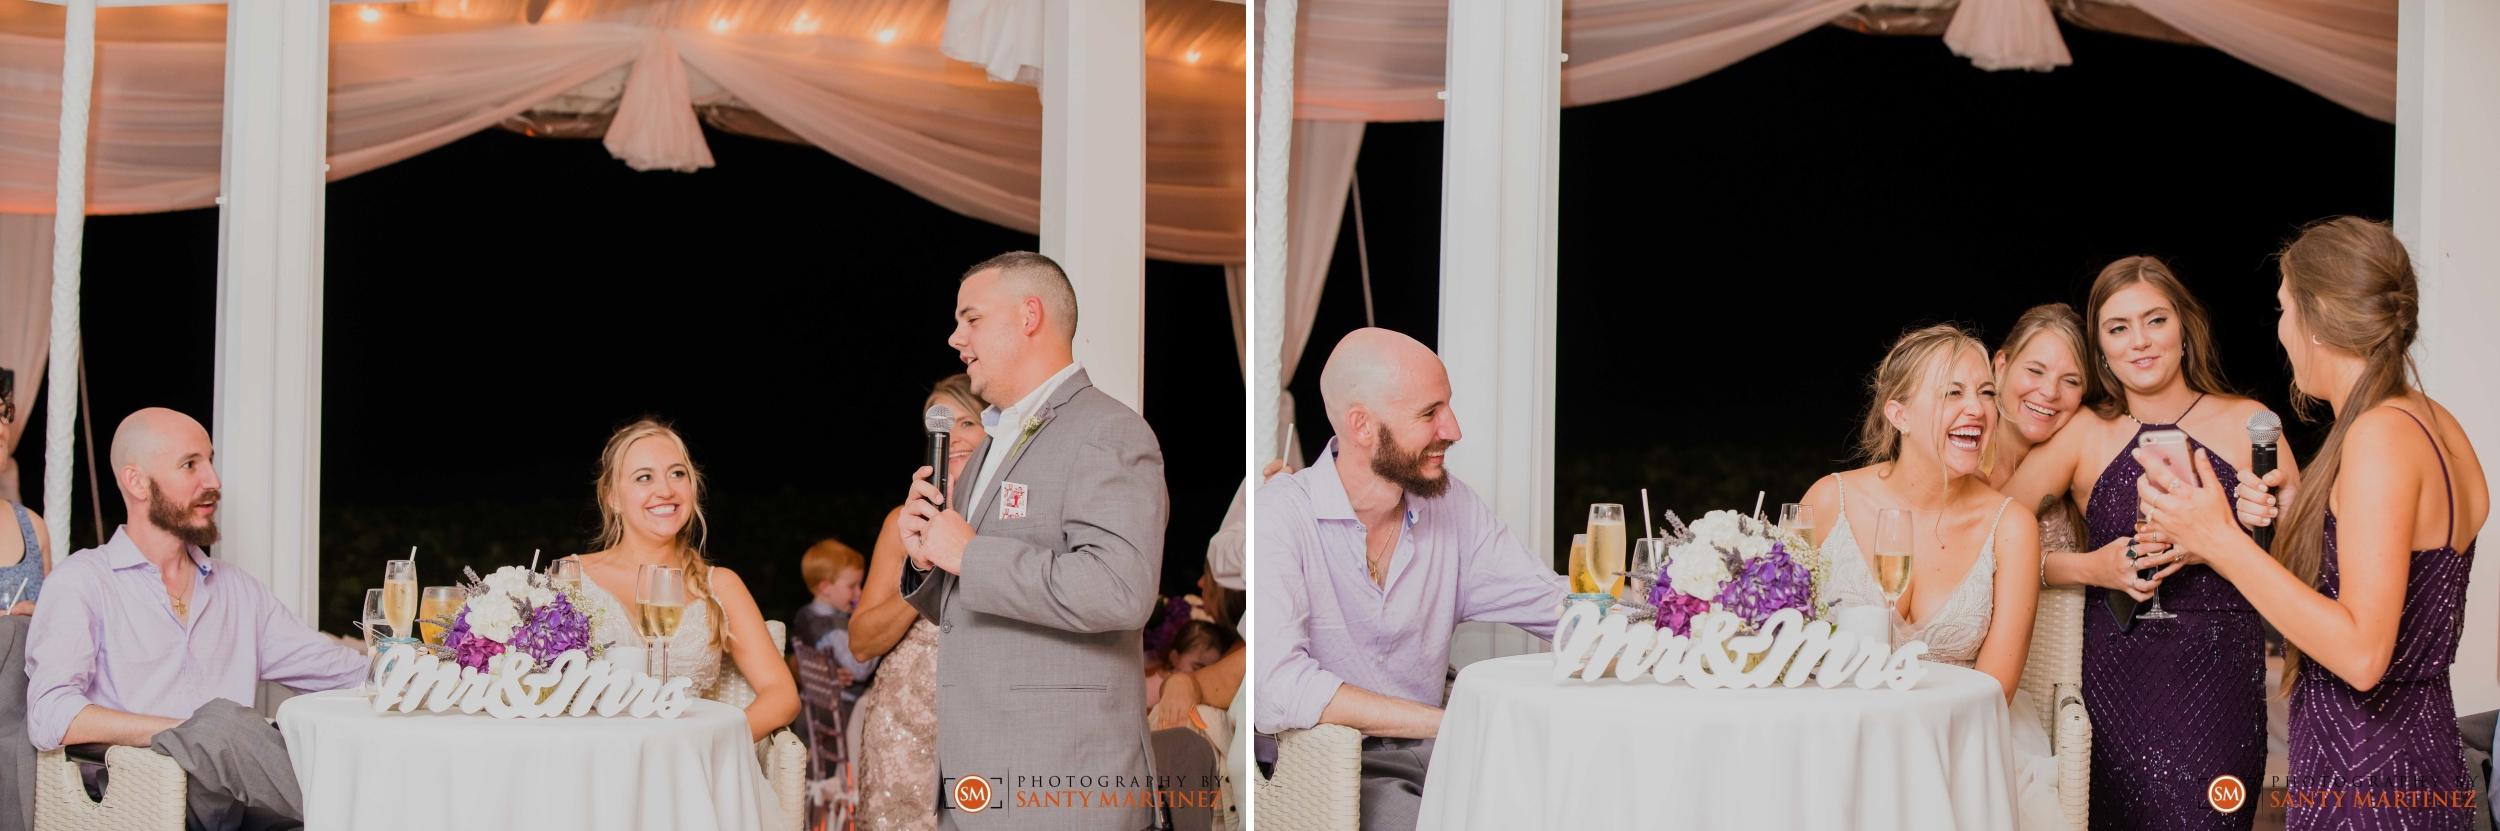 Wedding - Seagate Beach Club - Hotel - Delray Beach - Santy Martinez Photography 15.jpg